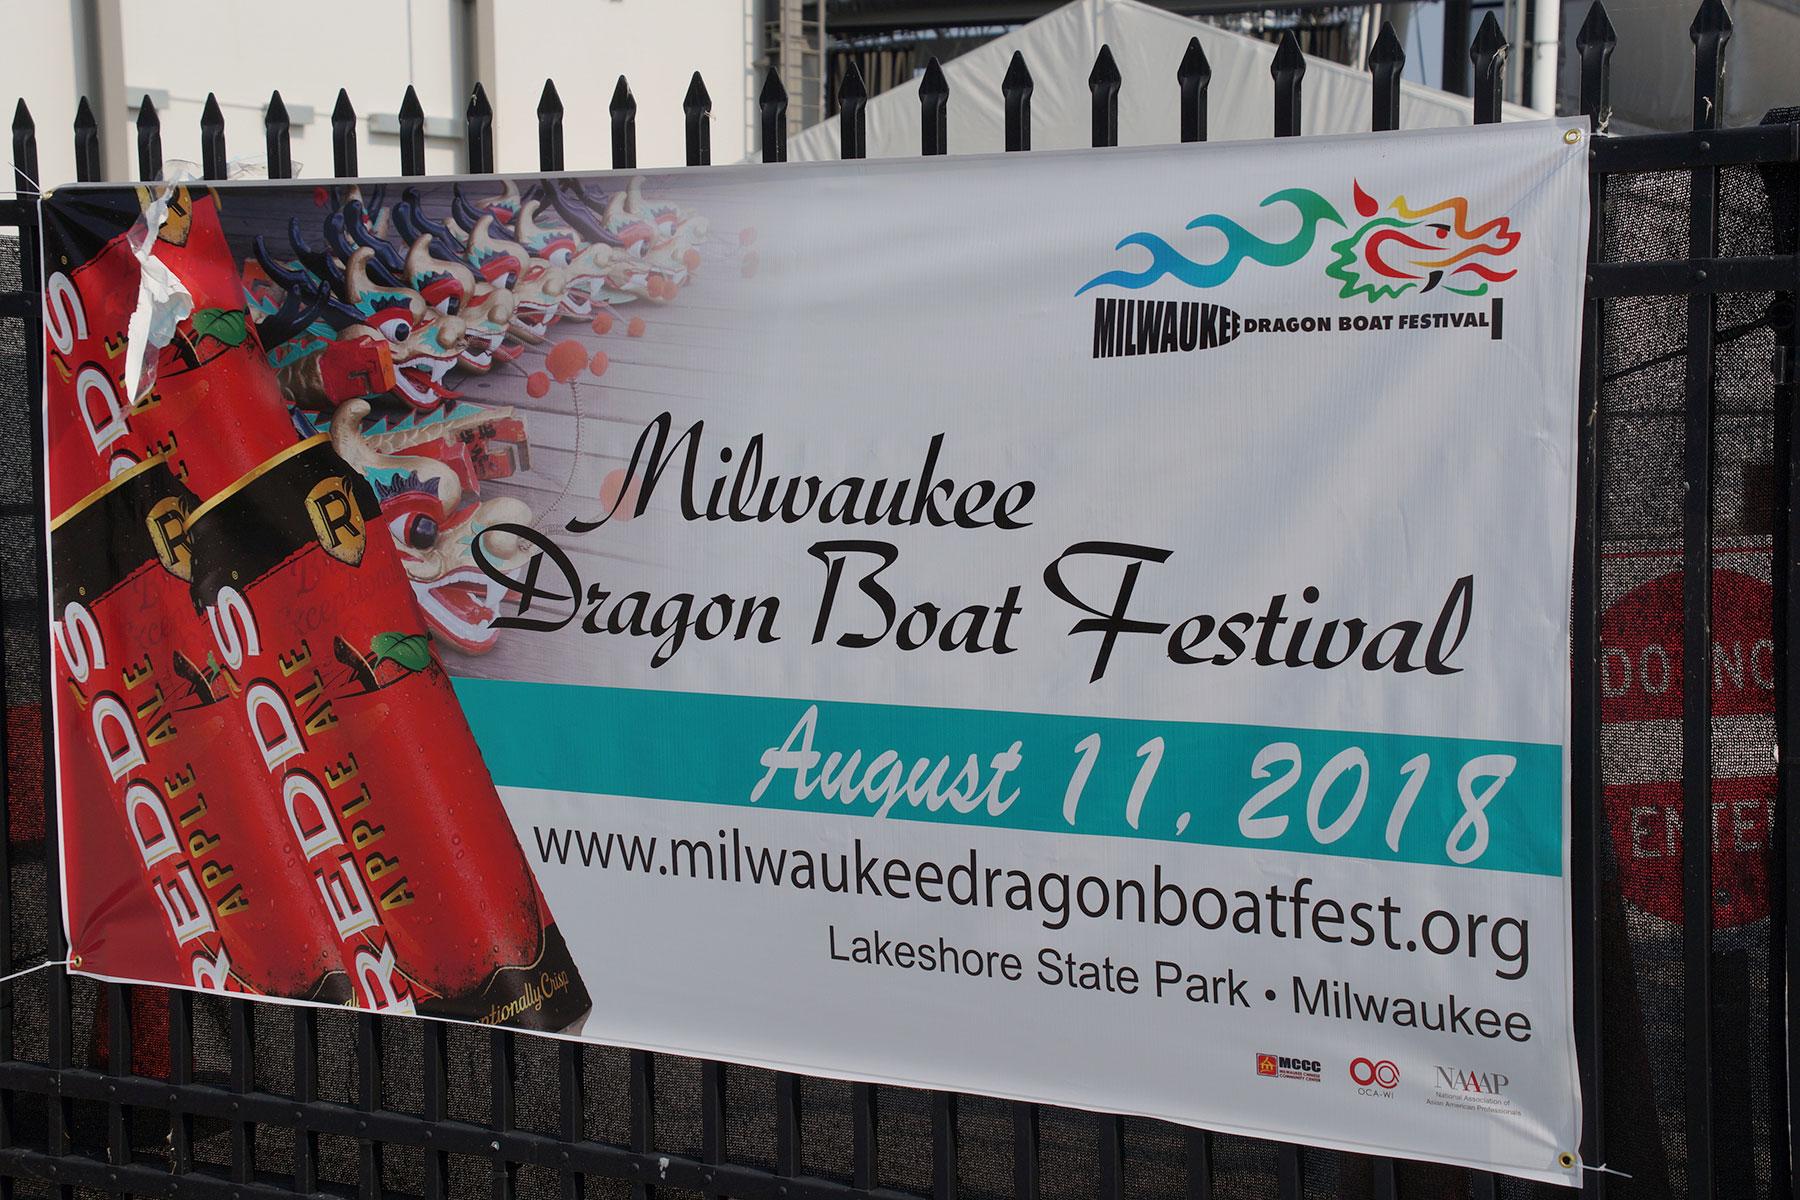 081118_dragonboat_002